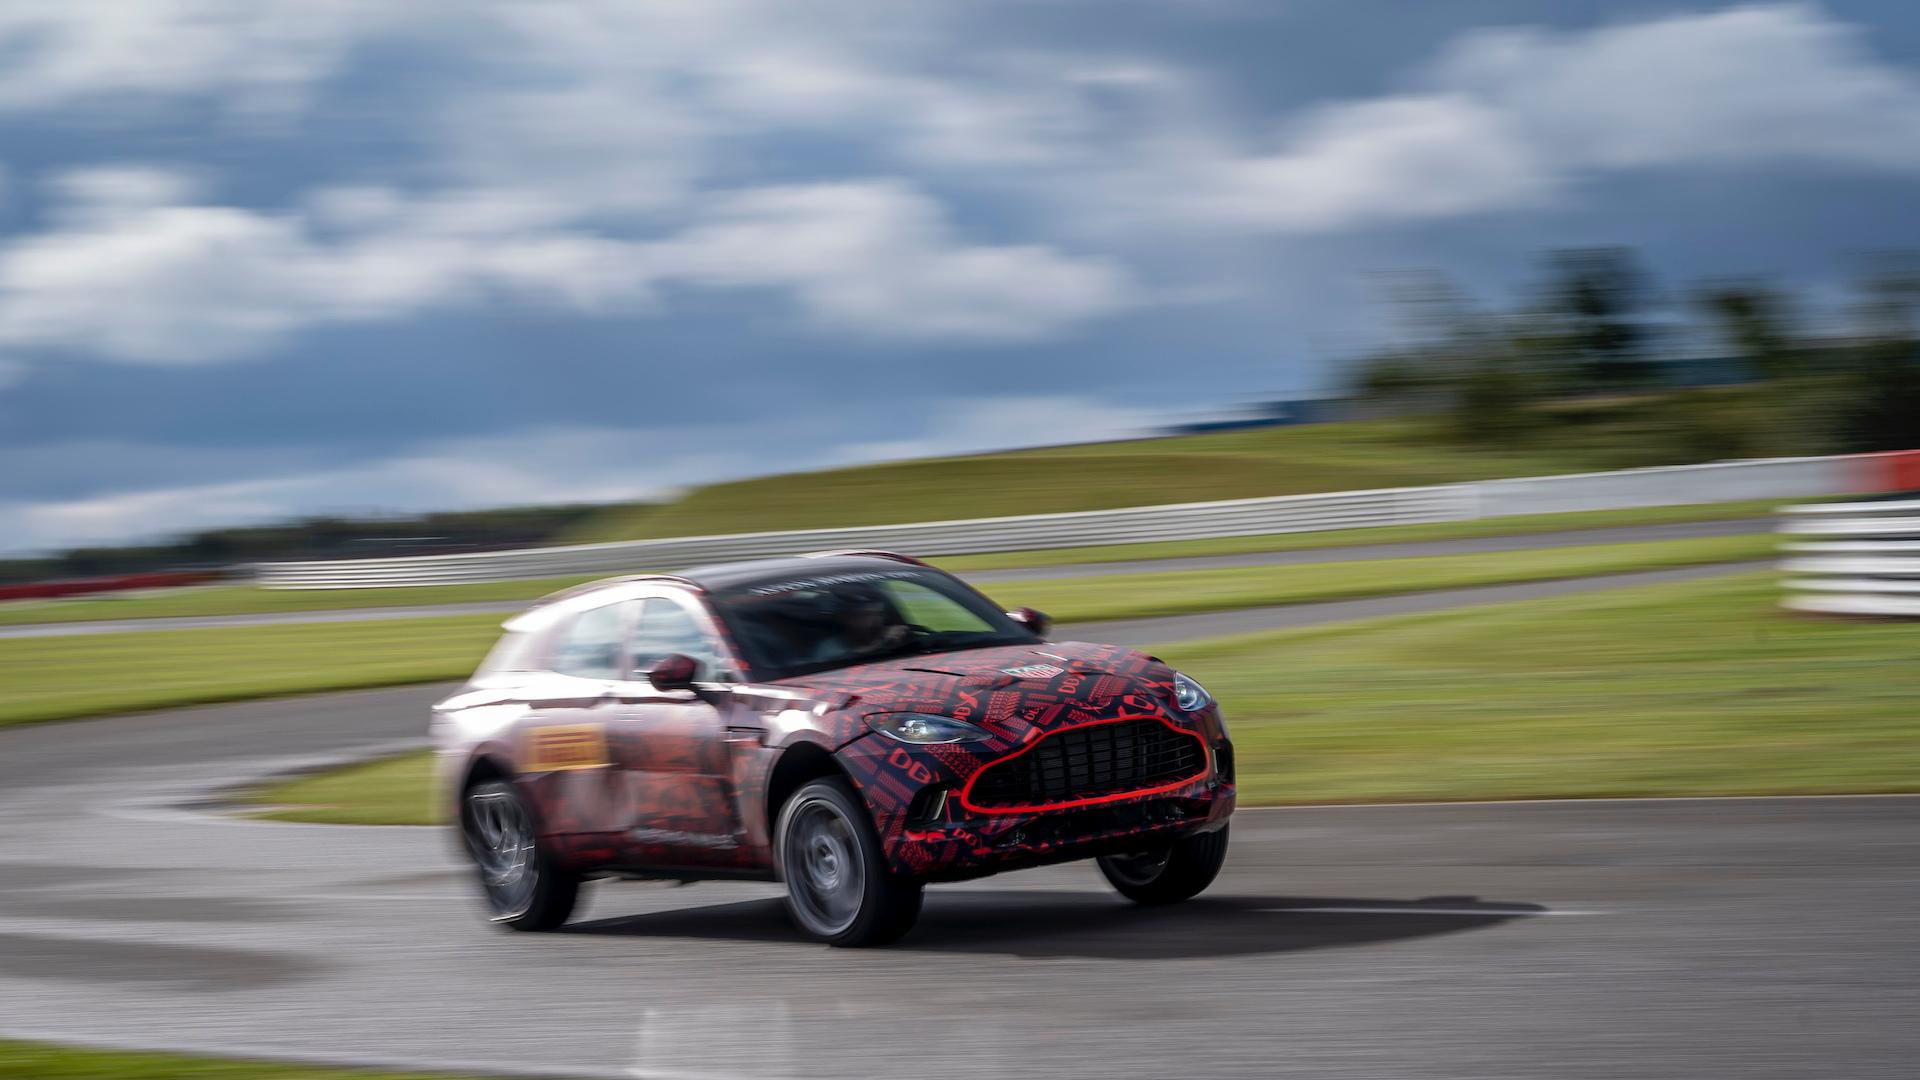 Teaser for Aston Martin DBX debuting in December 2019